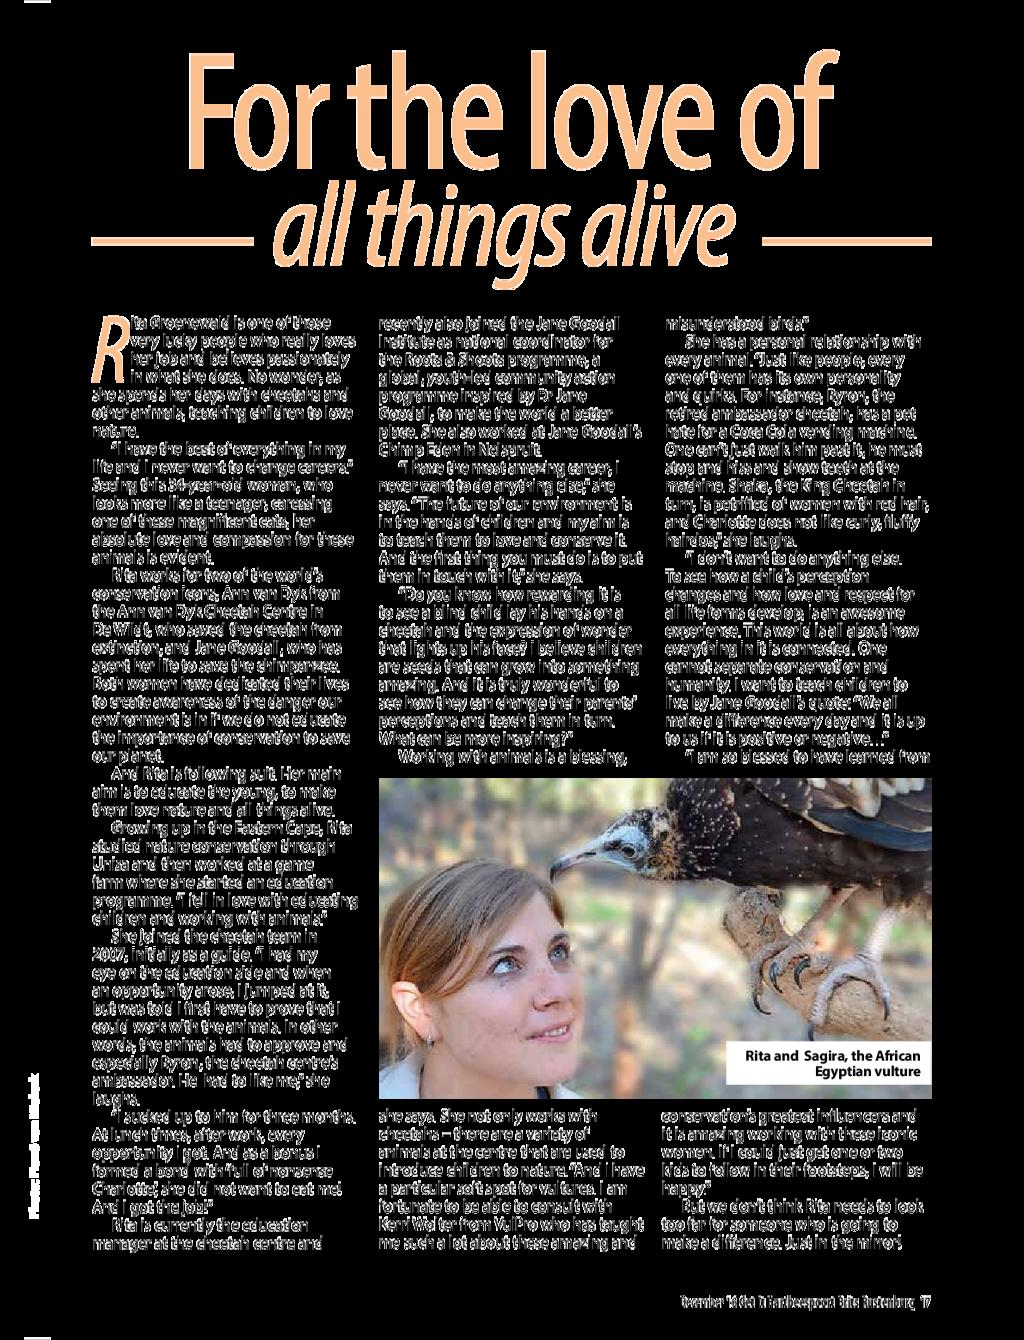 get-it-hartbeespoort-december-2016-epapers-page-19